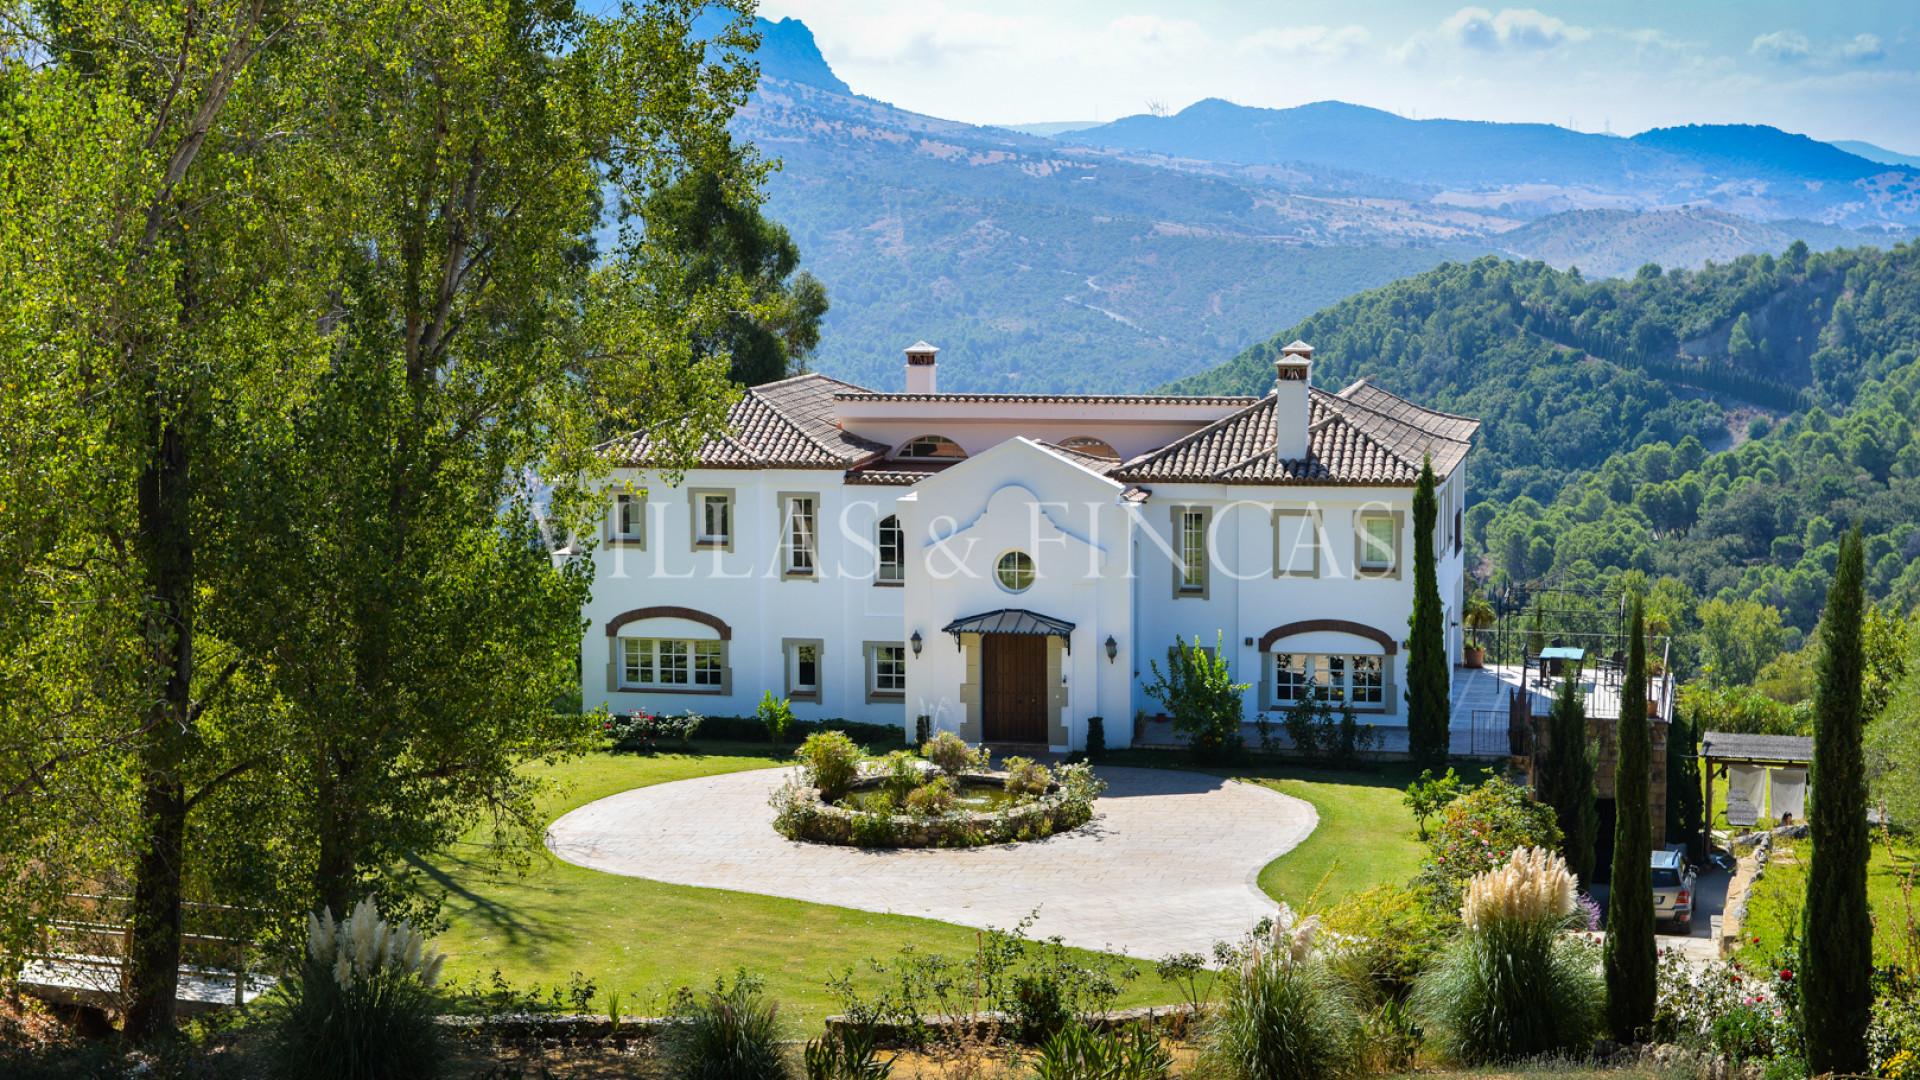 Country House in Gaucin